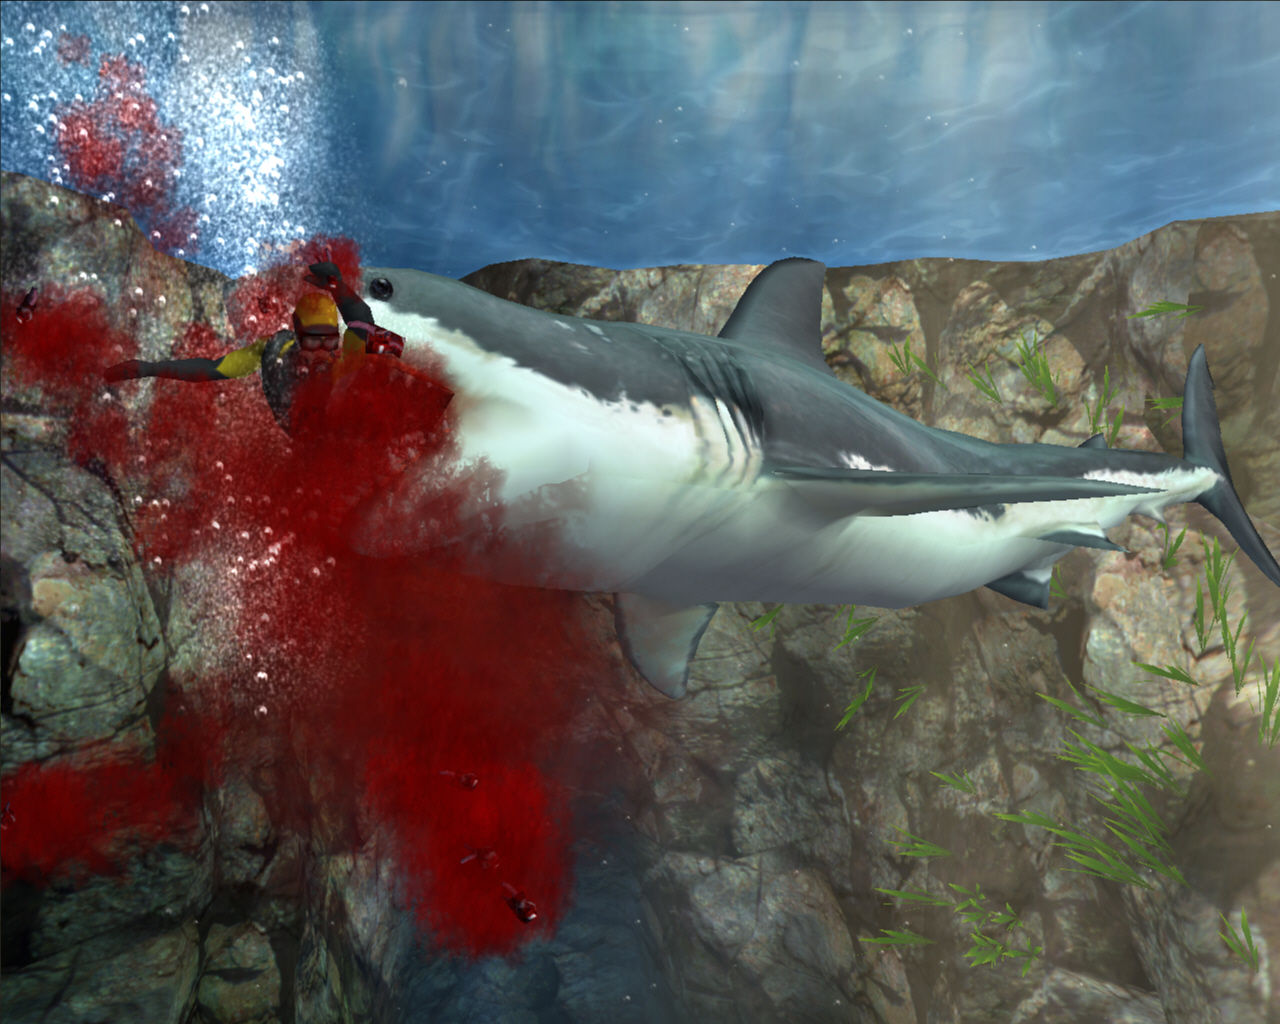 Jaws Unleashed - Jaws Unleashed